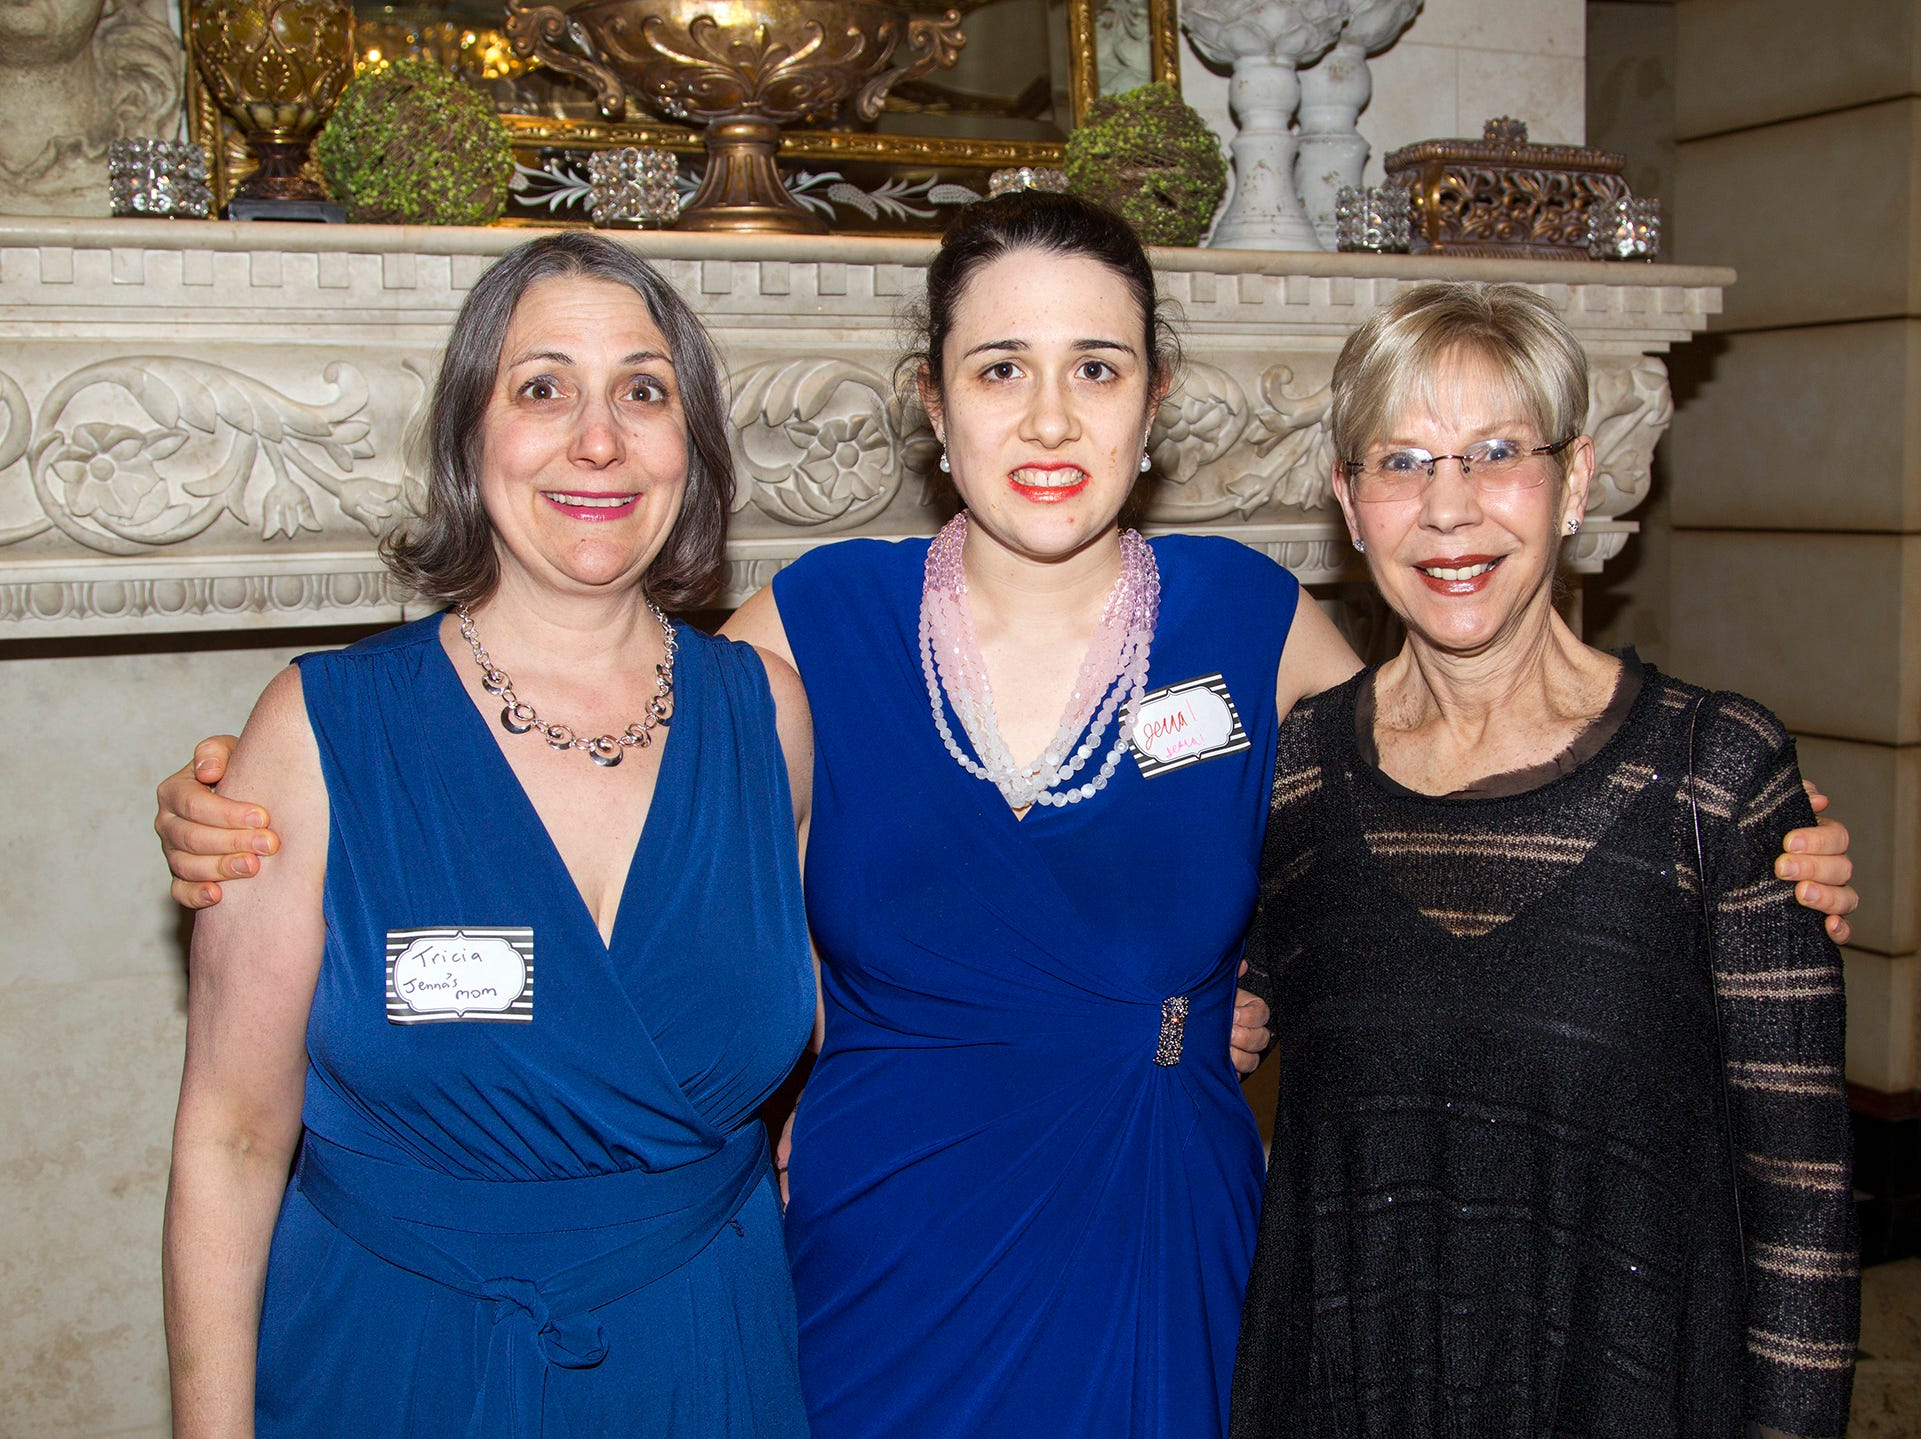 Tricia McKeegan, Jenna McKeegan, Joanne Dowling. Institute for Educational Achievement (IEA) held its annual Dinner Dance at Seasons in Washington Township. 02/02/2019